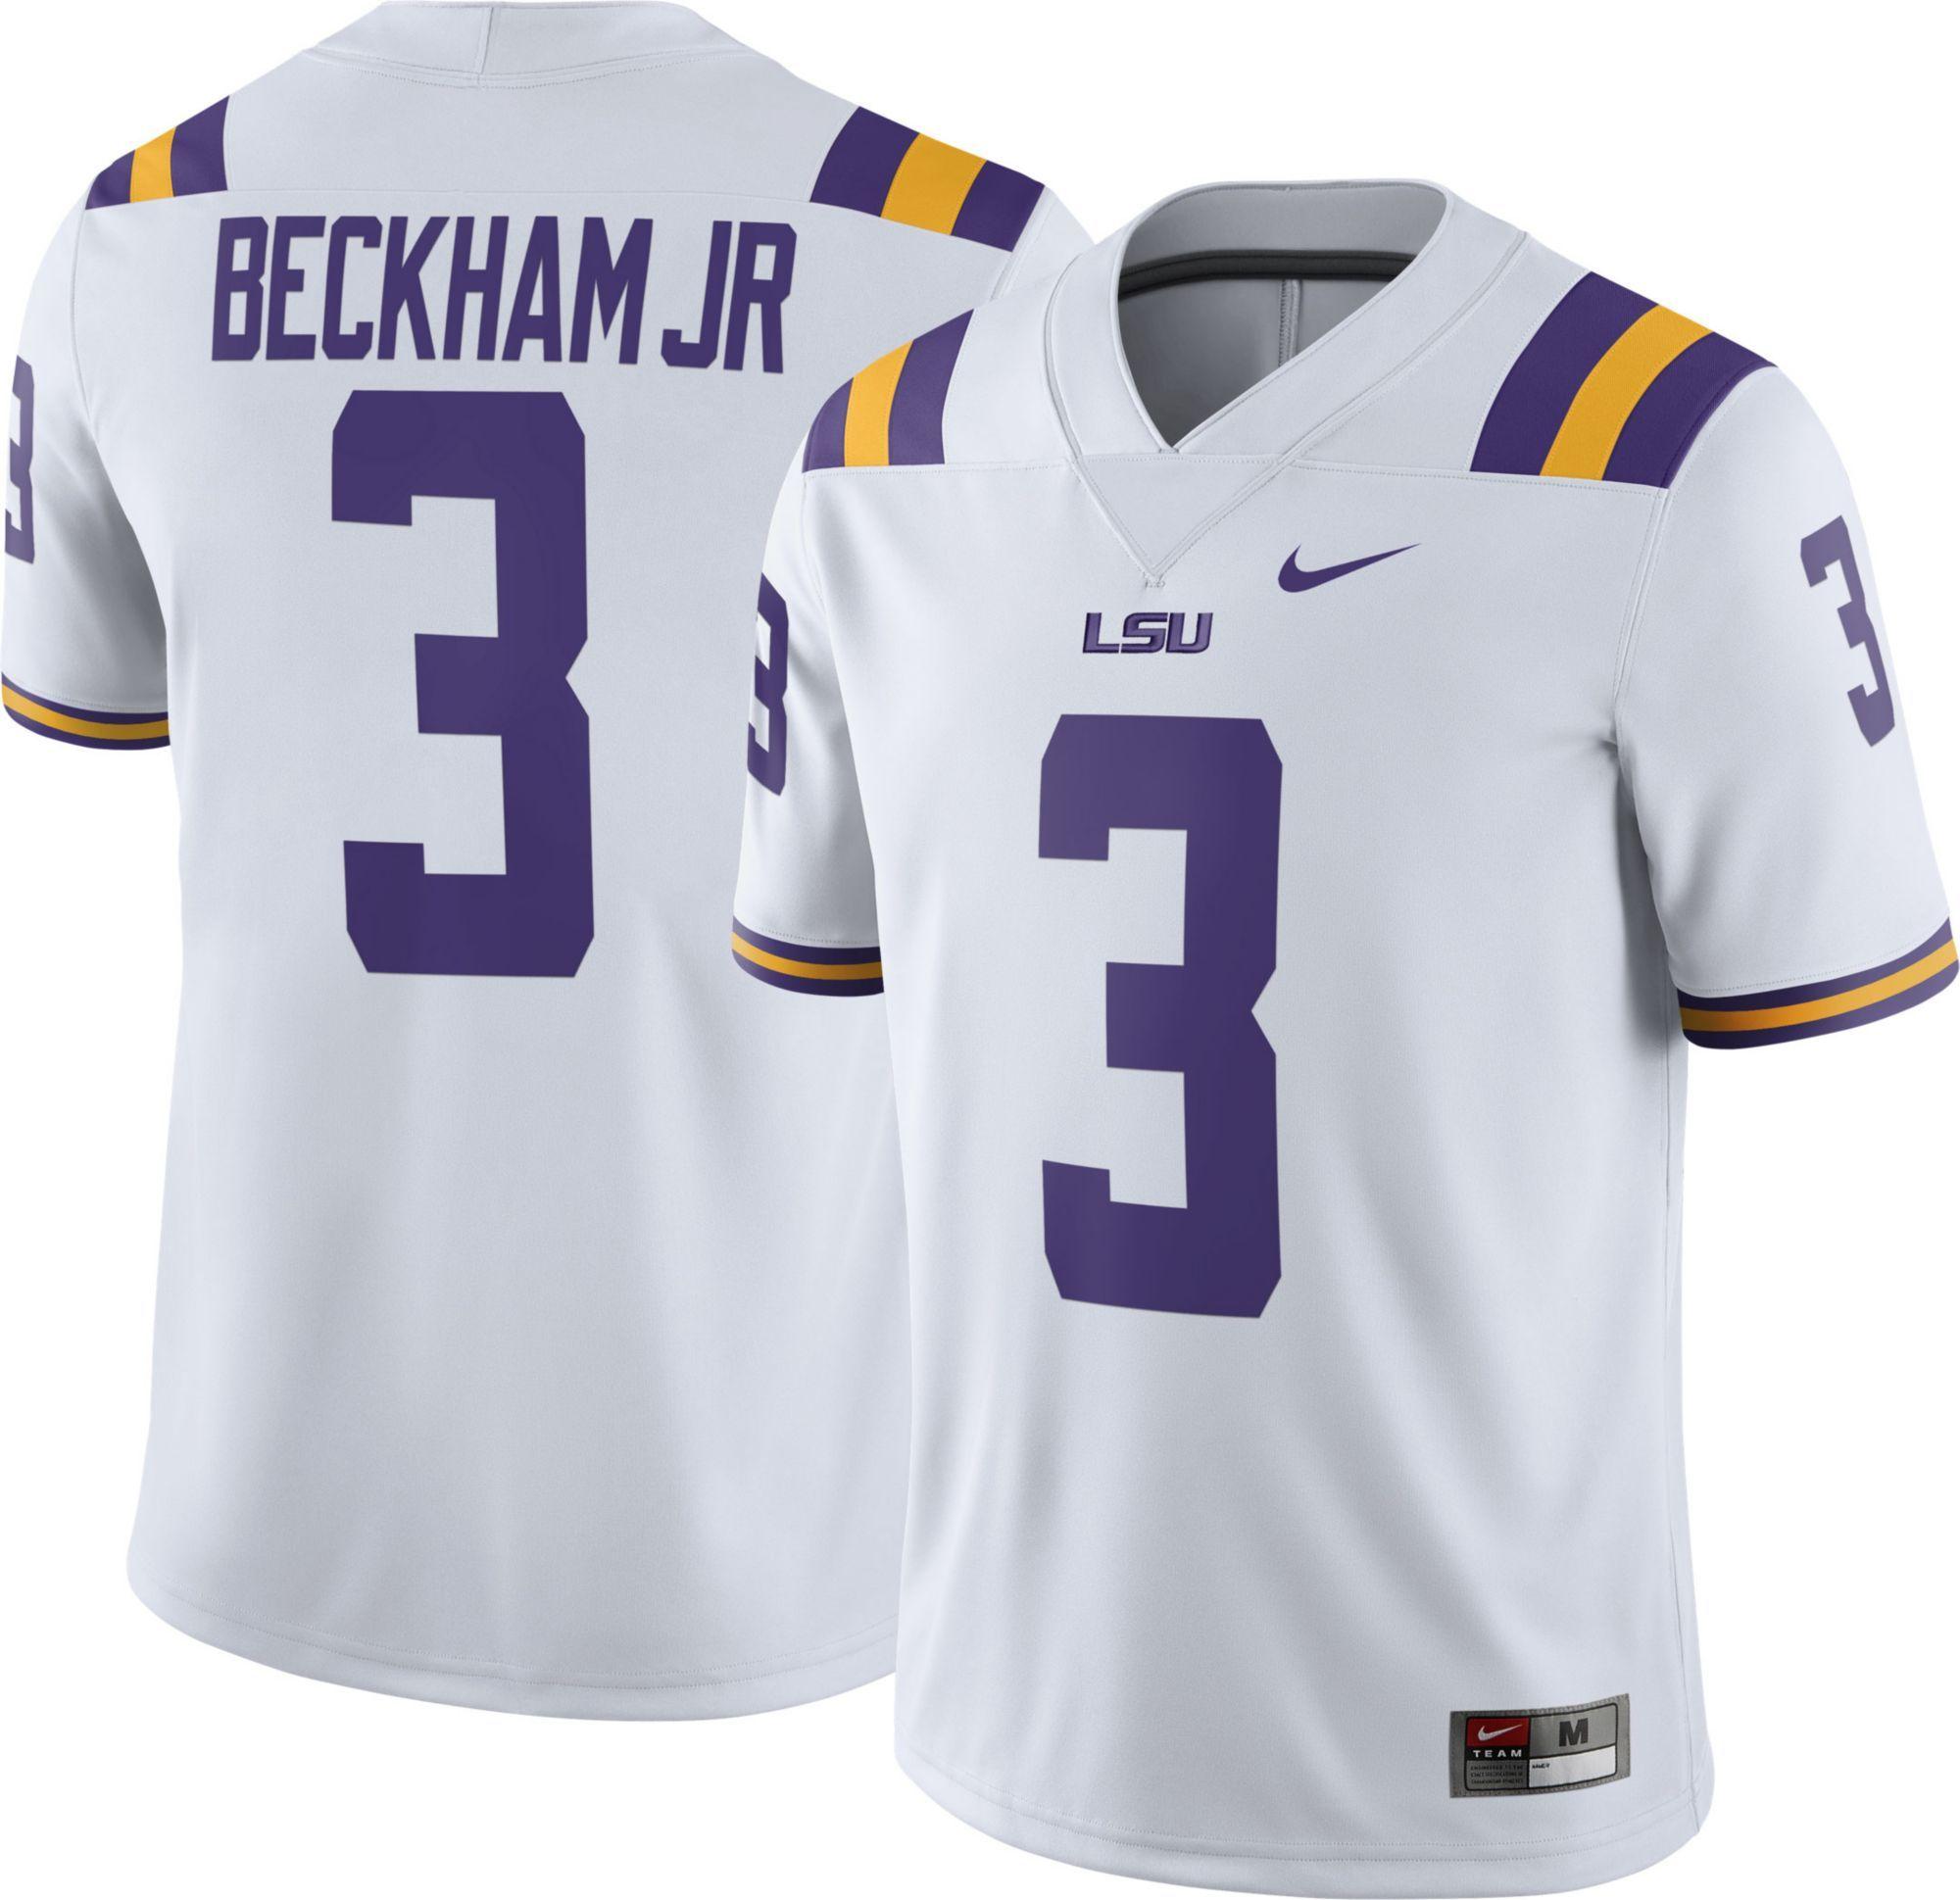 new style 2d280 678c1 Nike Men's Odell Beckham Jr. LSU Tigers #3 White Replica ...